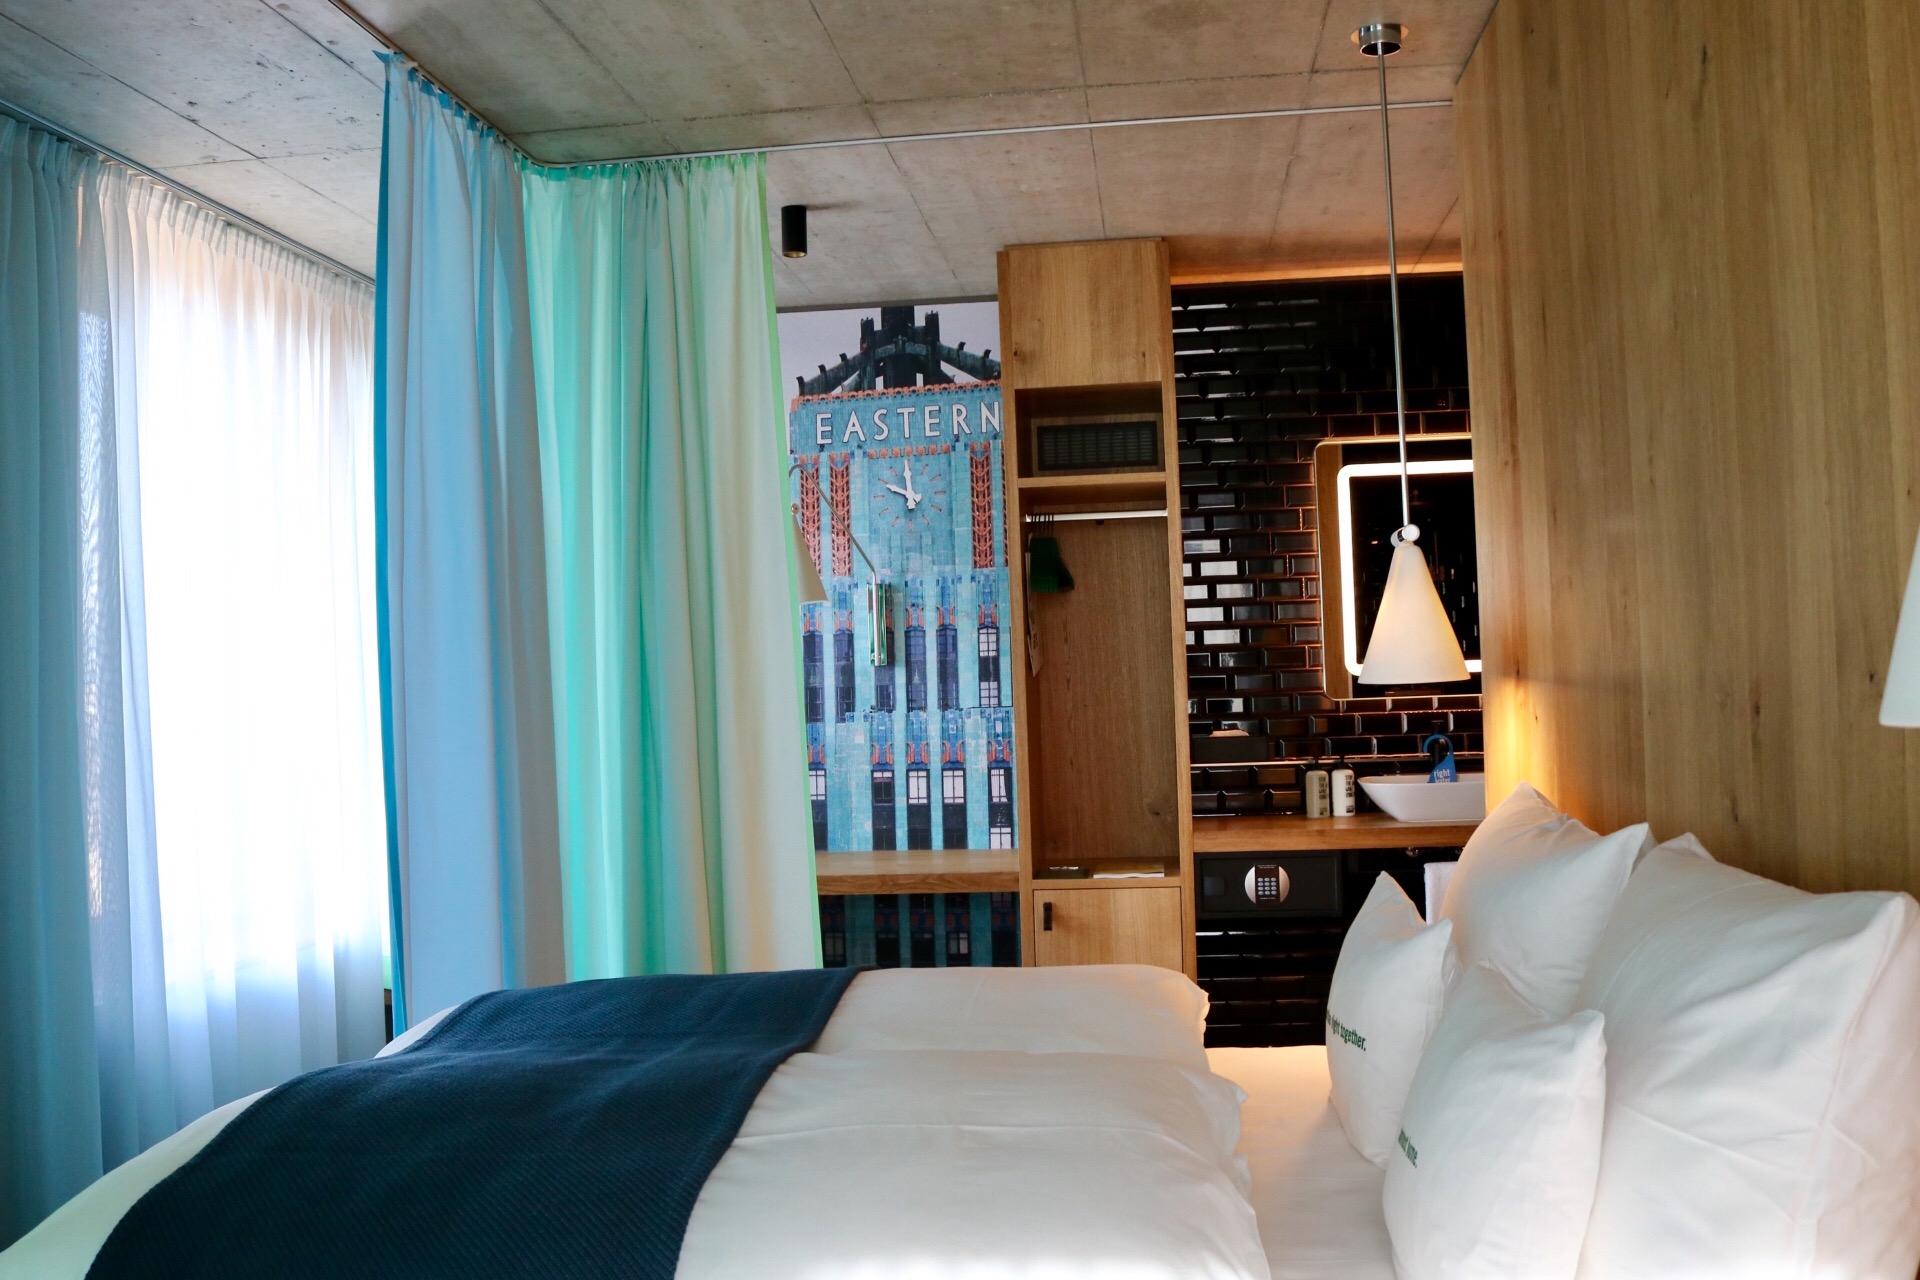 25 hours hotels zurich langstrasse for Designhotel 25hours